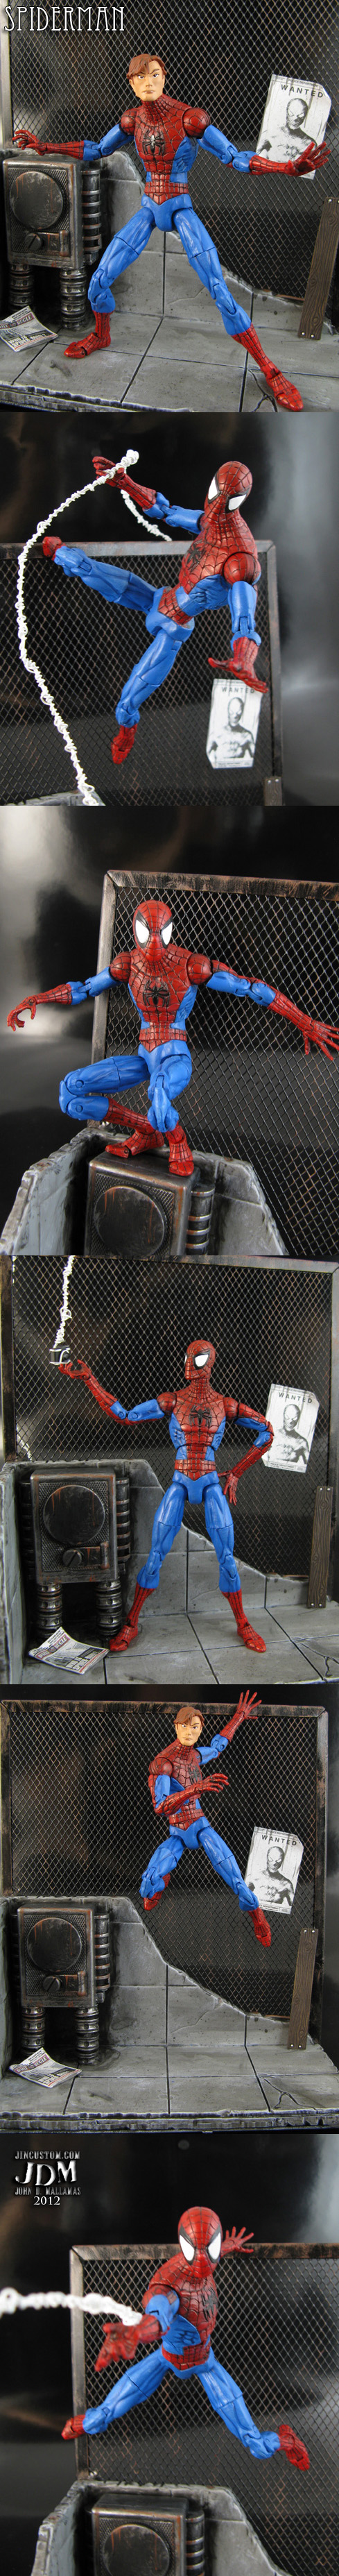 Amazing Spiderman Figure